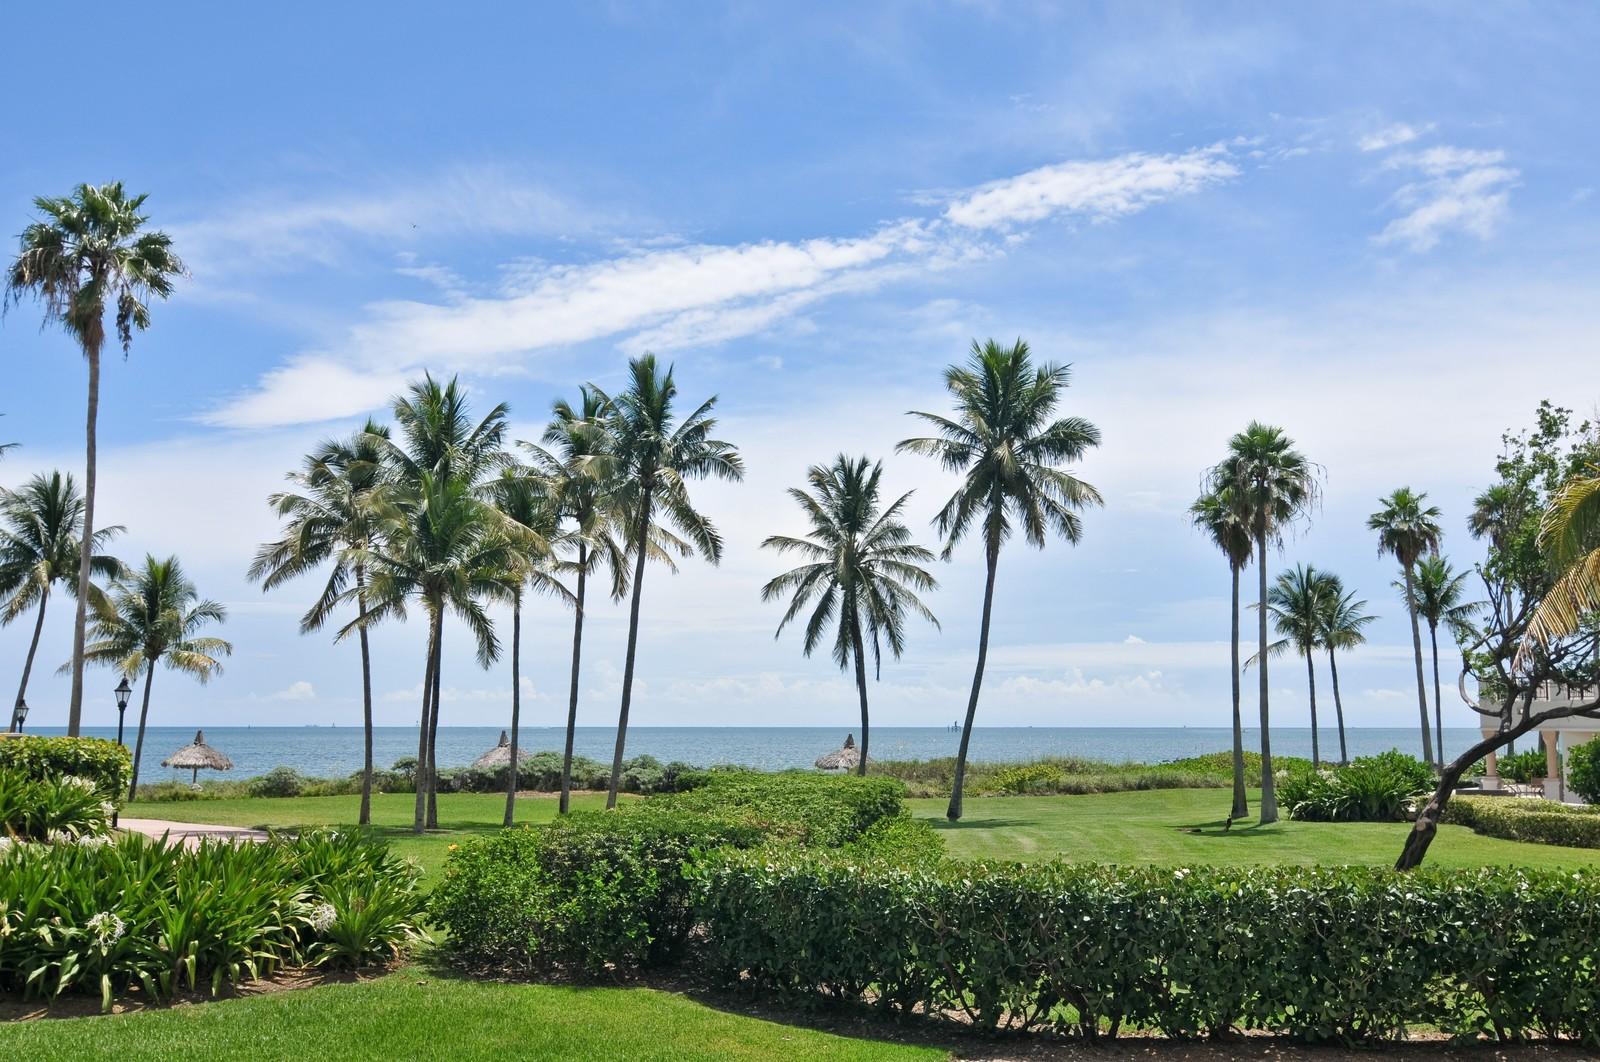 Real Estate Photography - 19213 Fisher Island Drive, Fisher Island, FL, 33109 - Beach